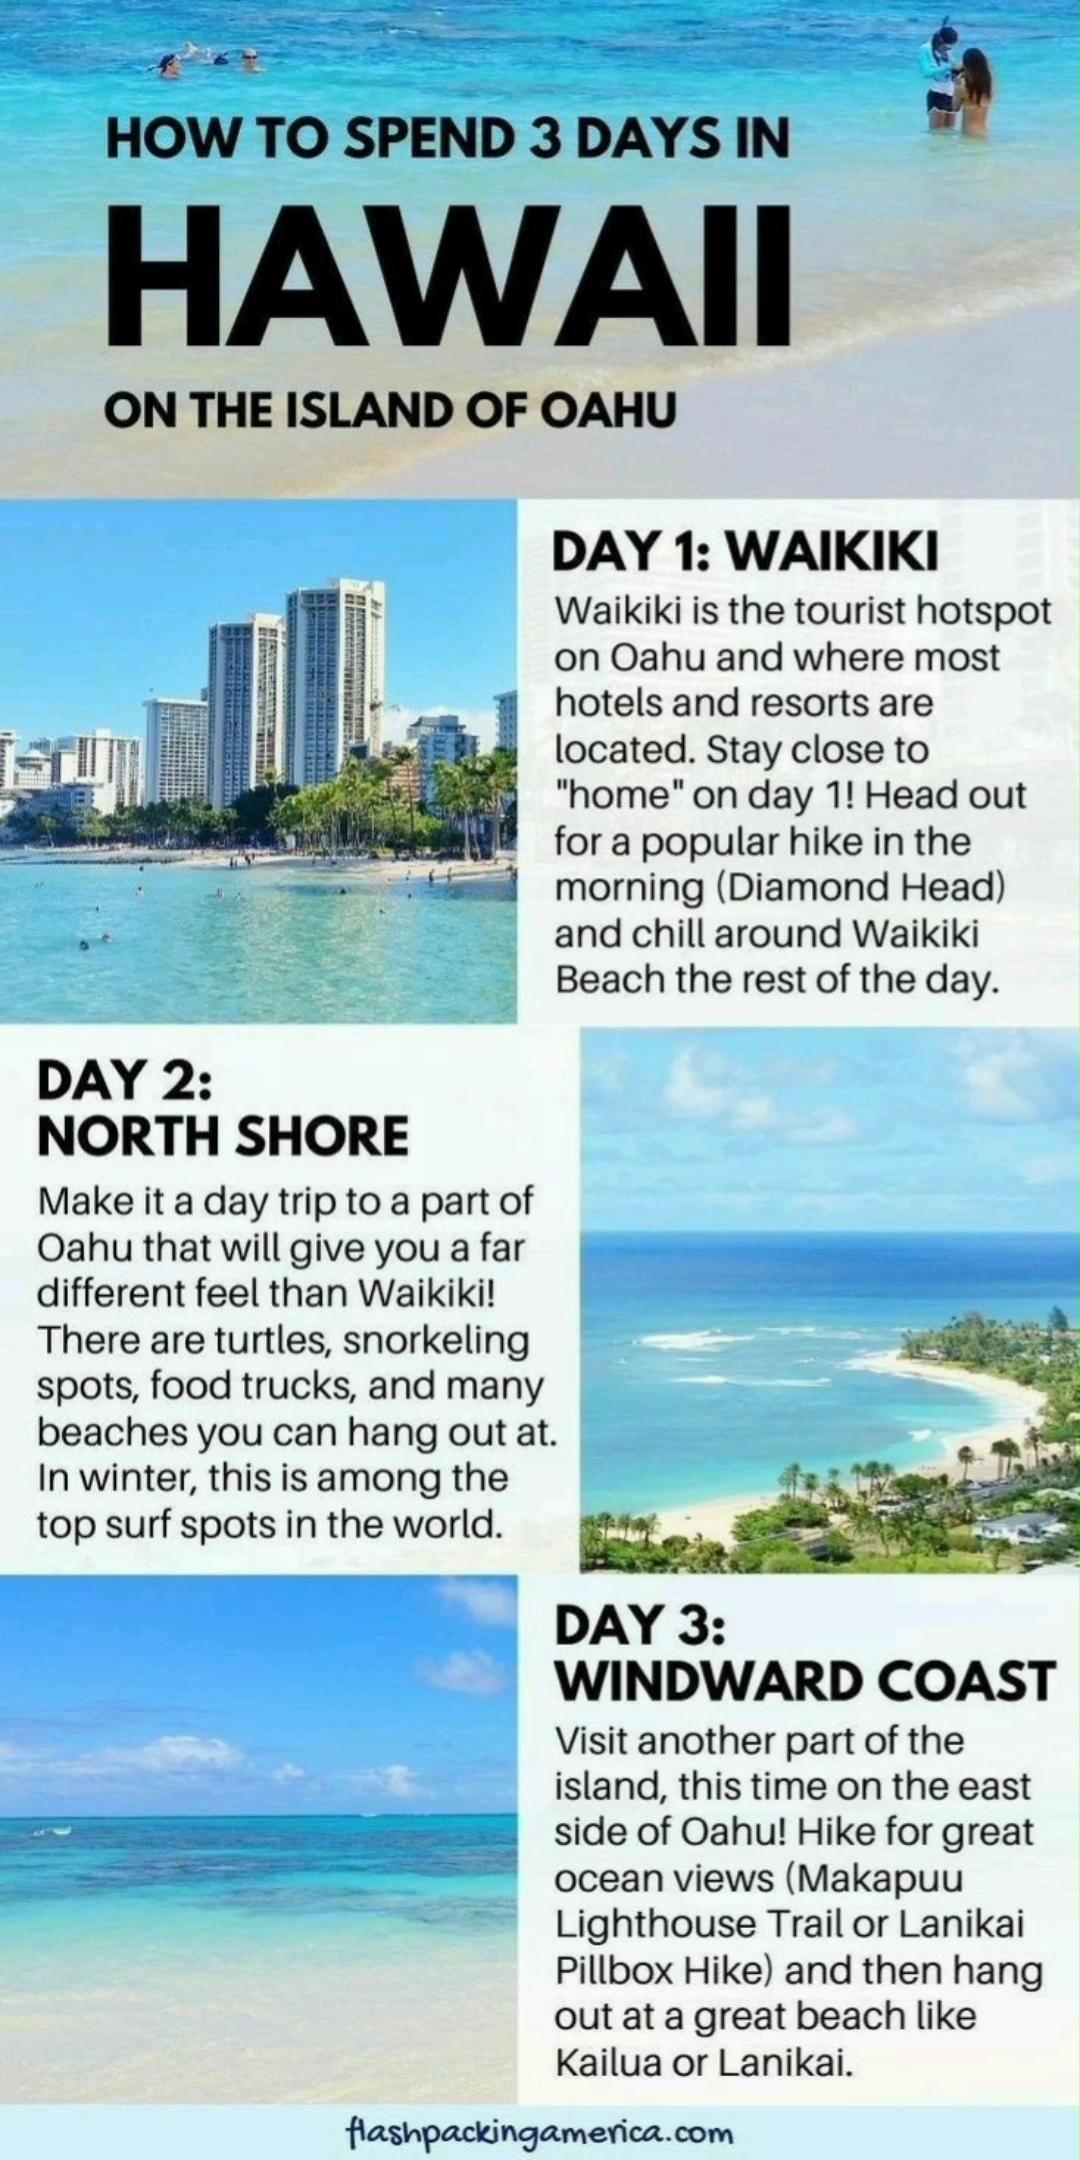 3 amazing days in Hawaii on the island of Oahu (Ho